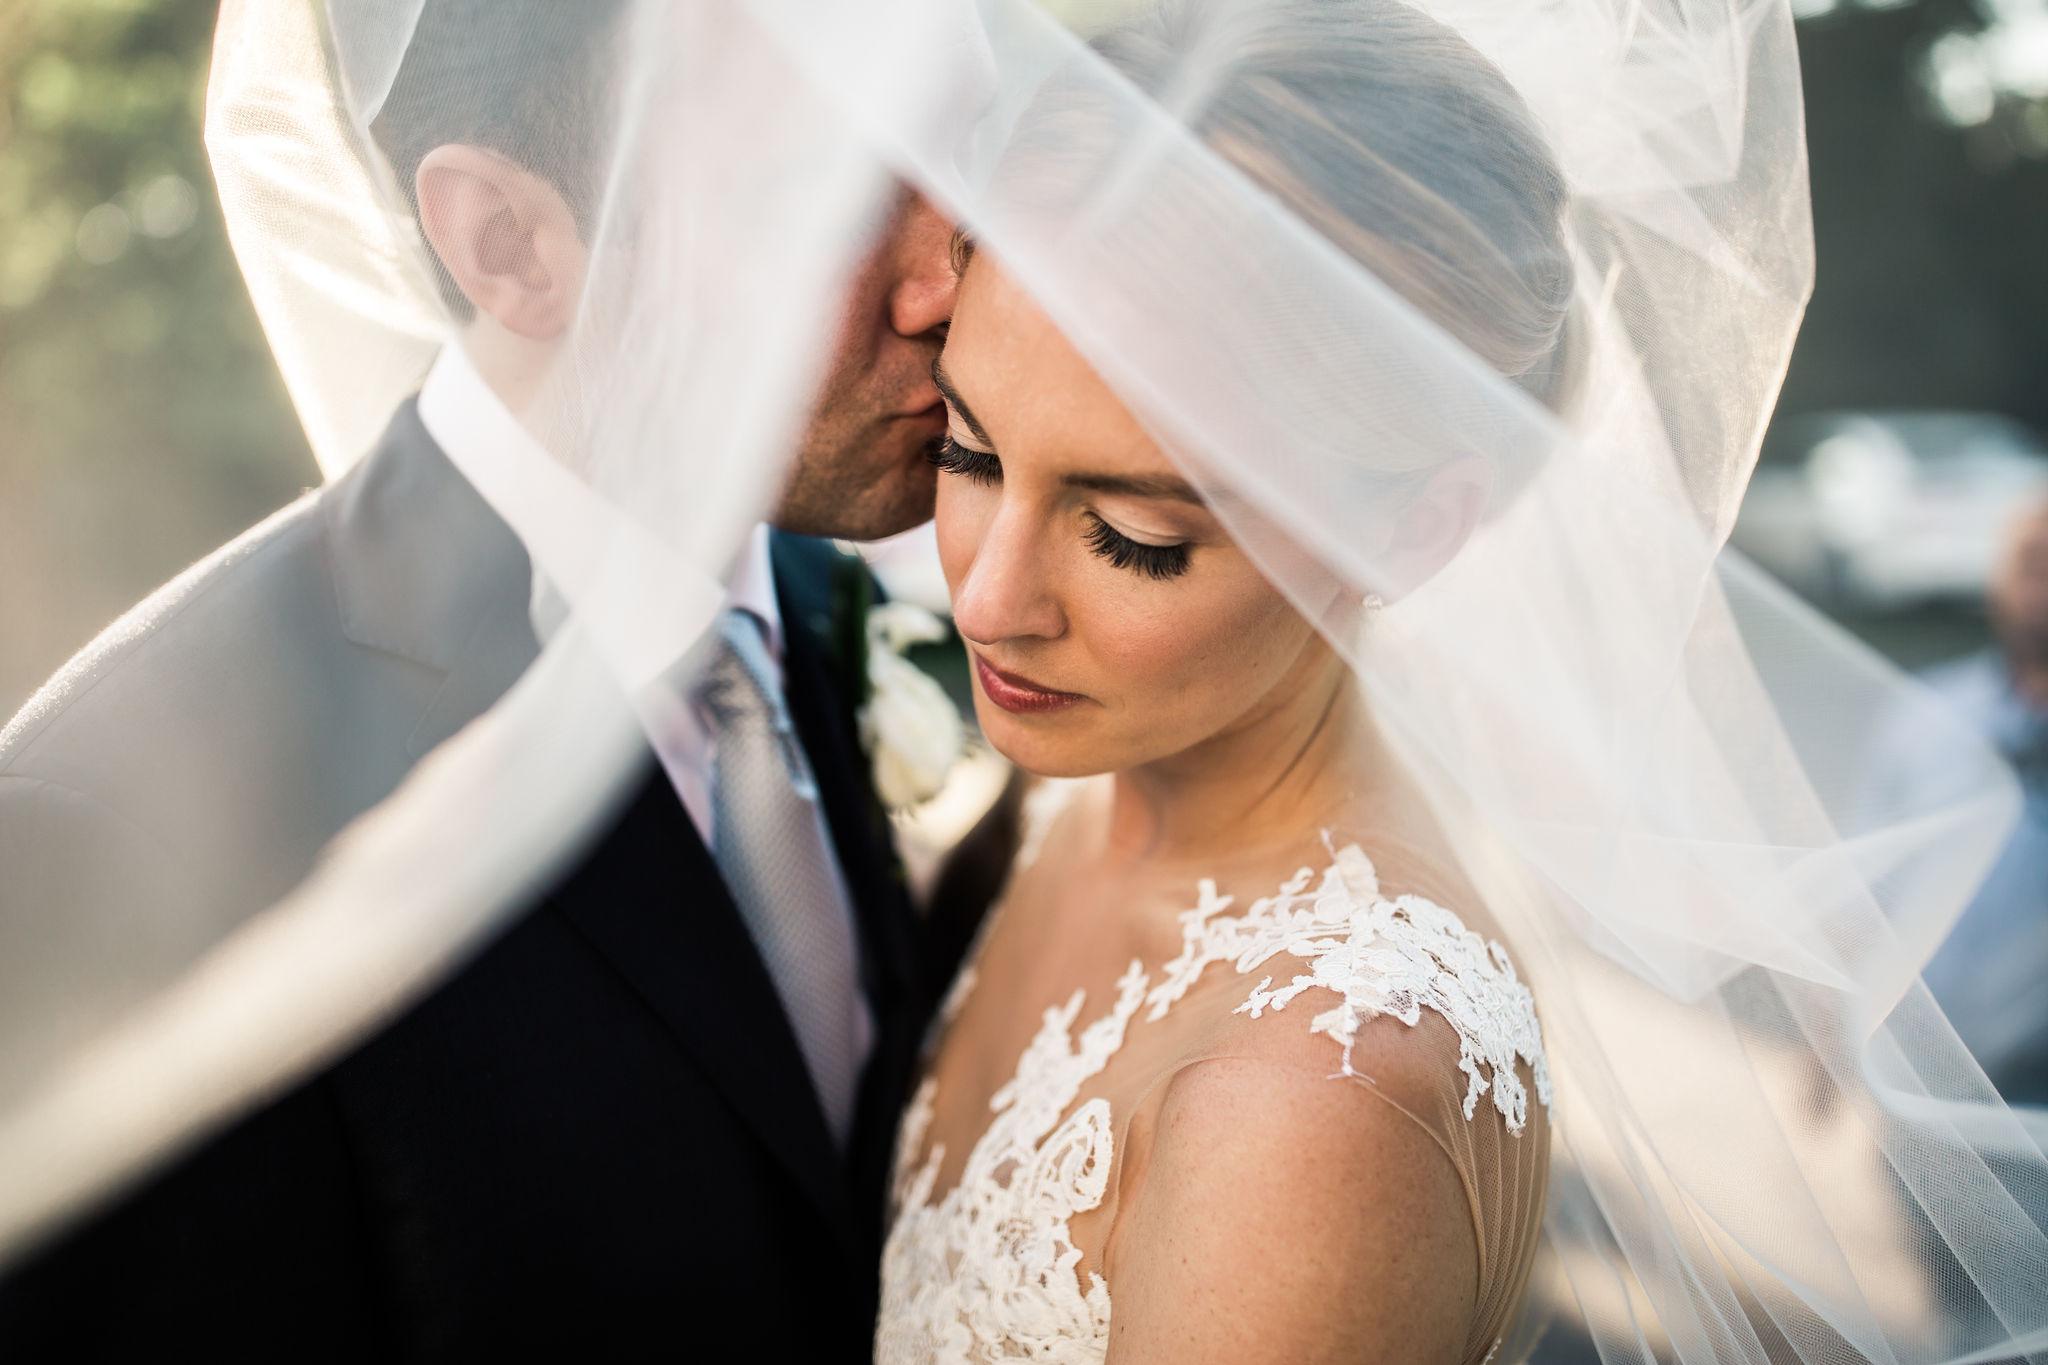 connecticut wedding 11.jpg